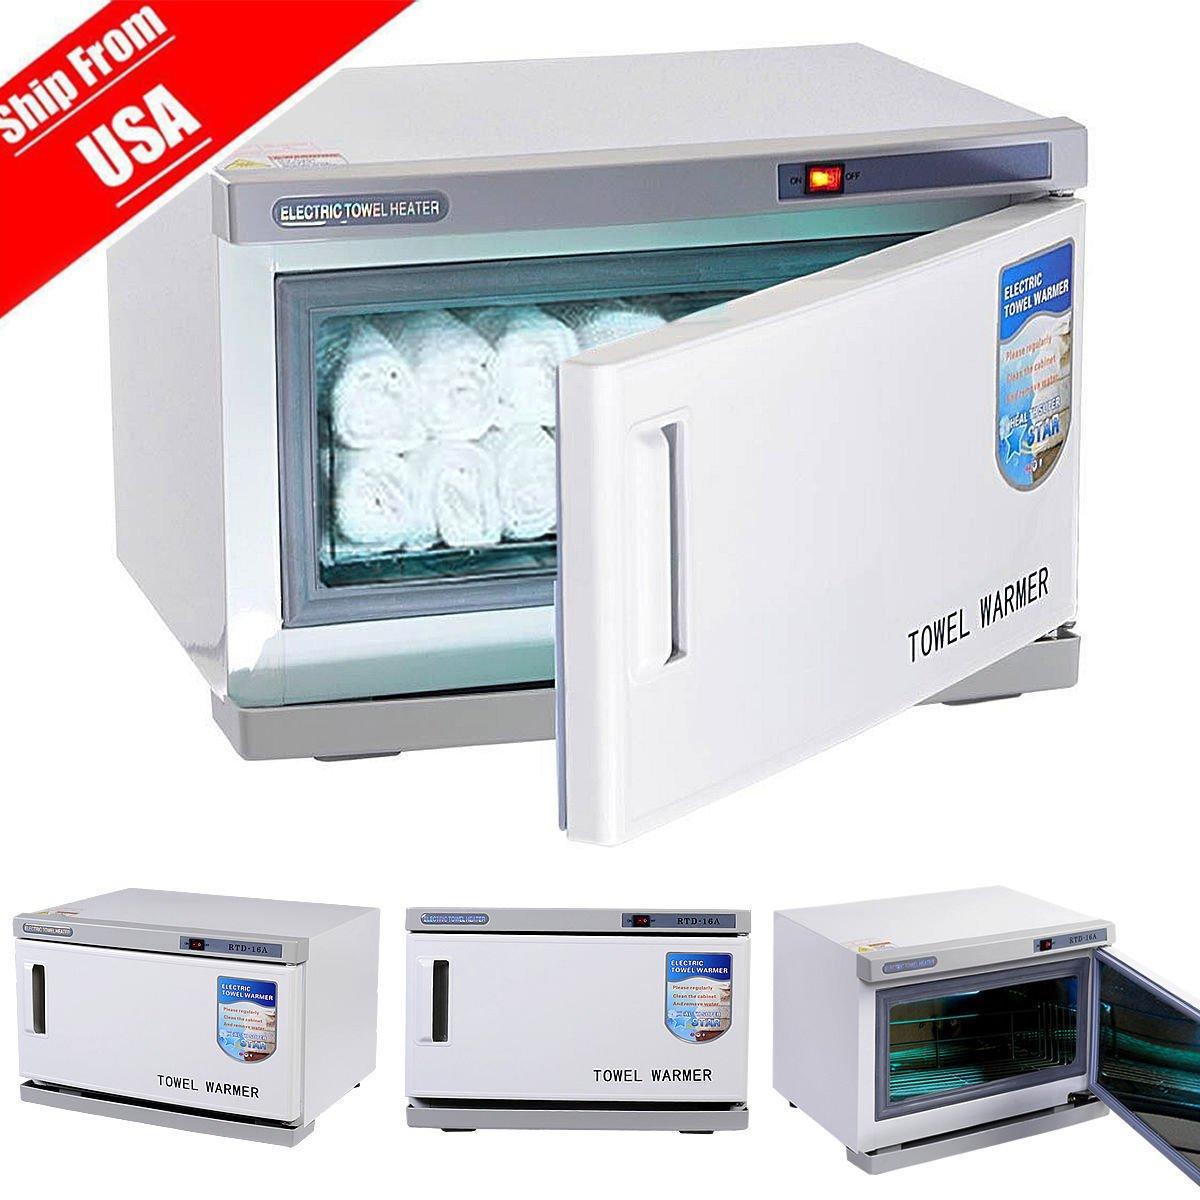 2 in 1 UV sterilizer cabinet and Hot towel warmer 16L